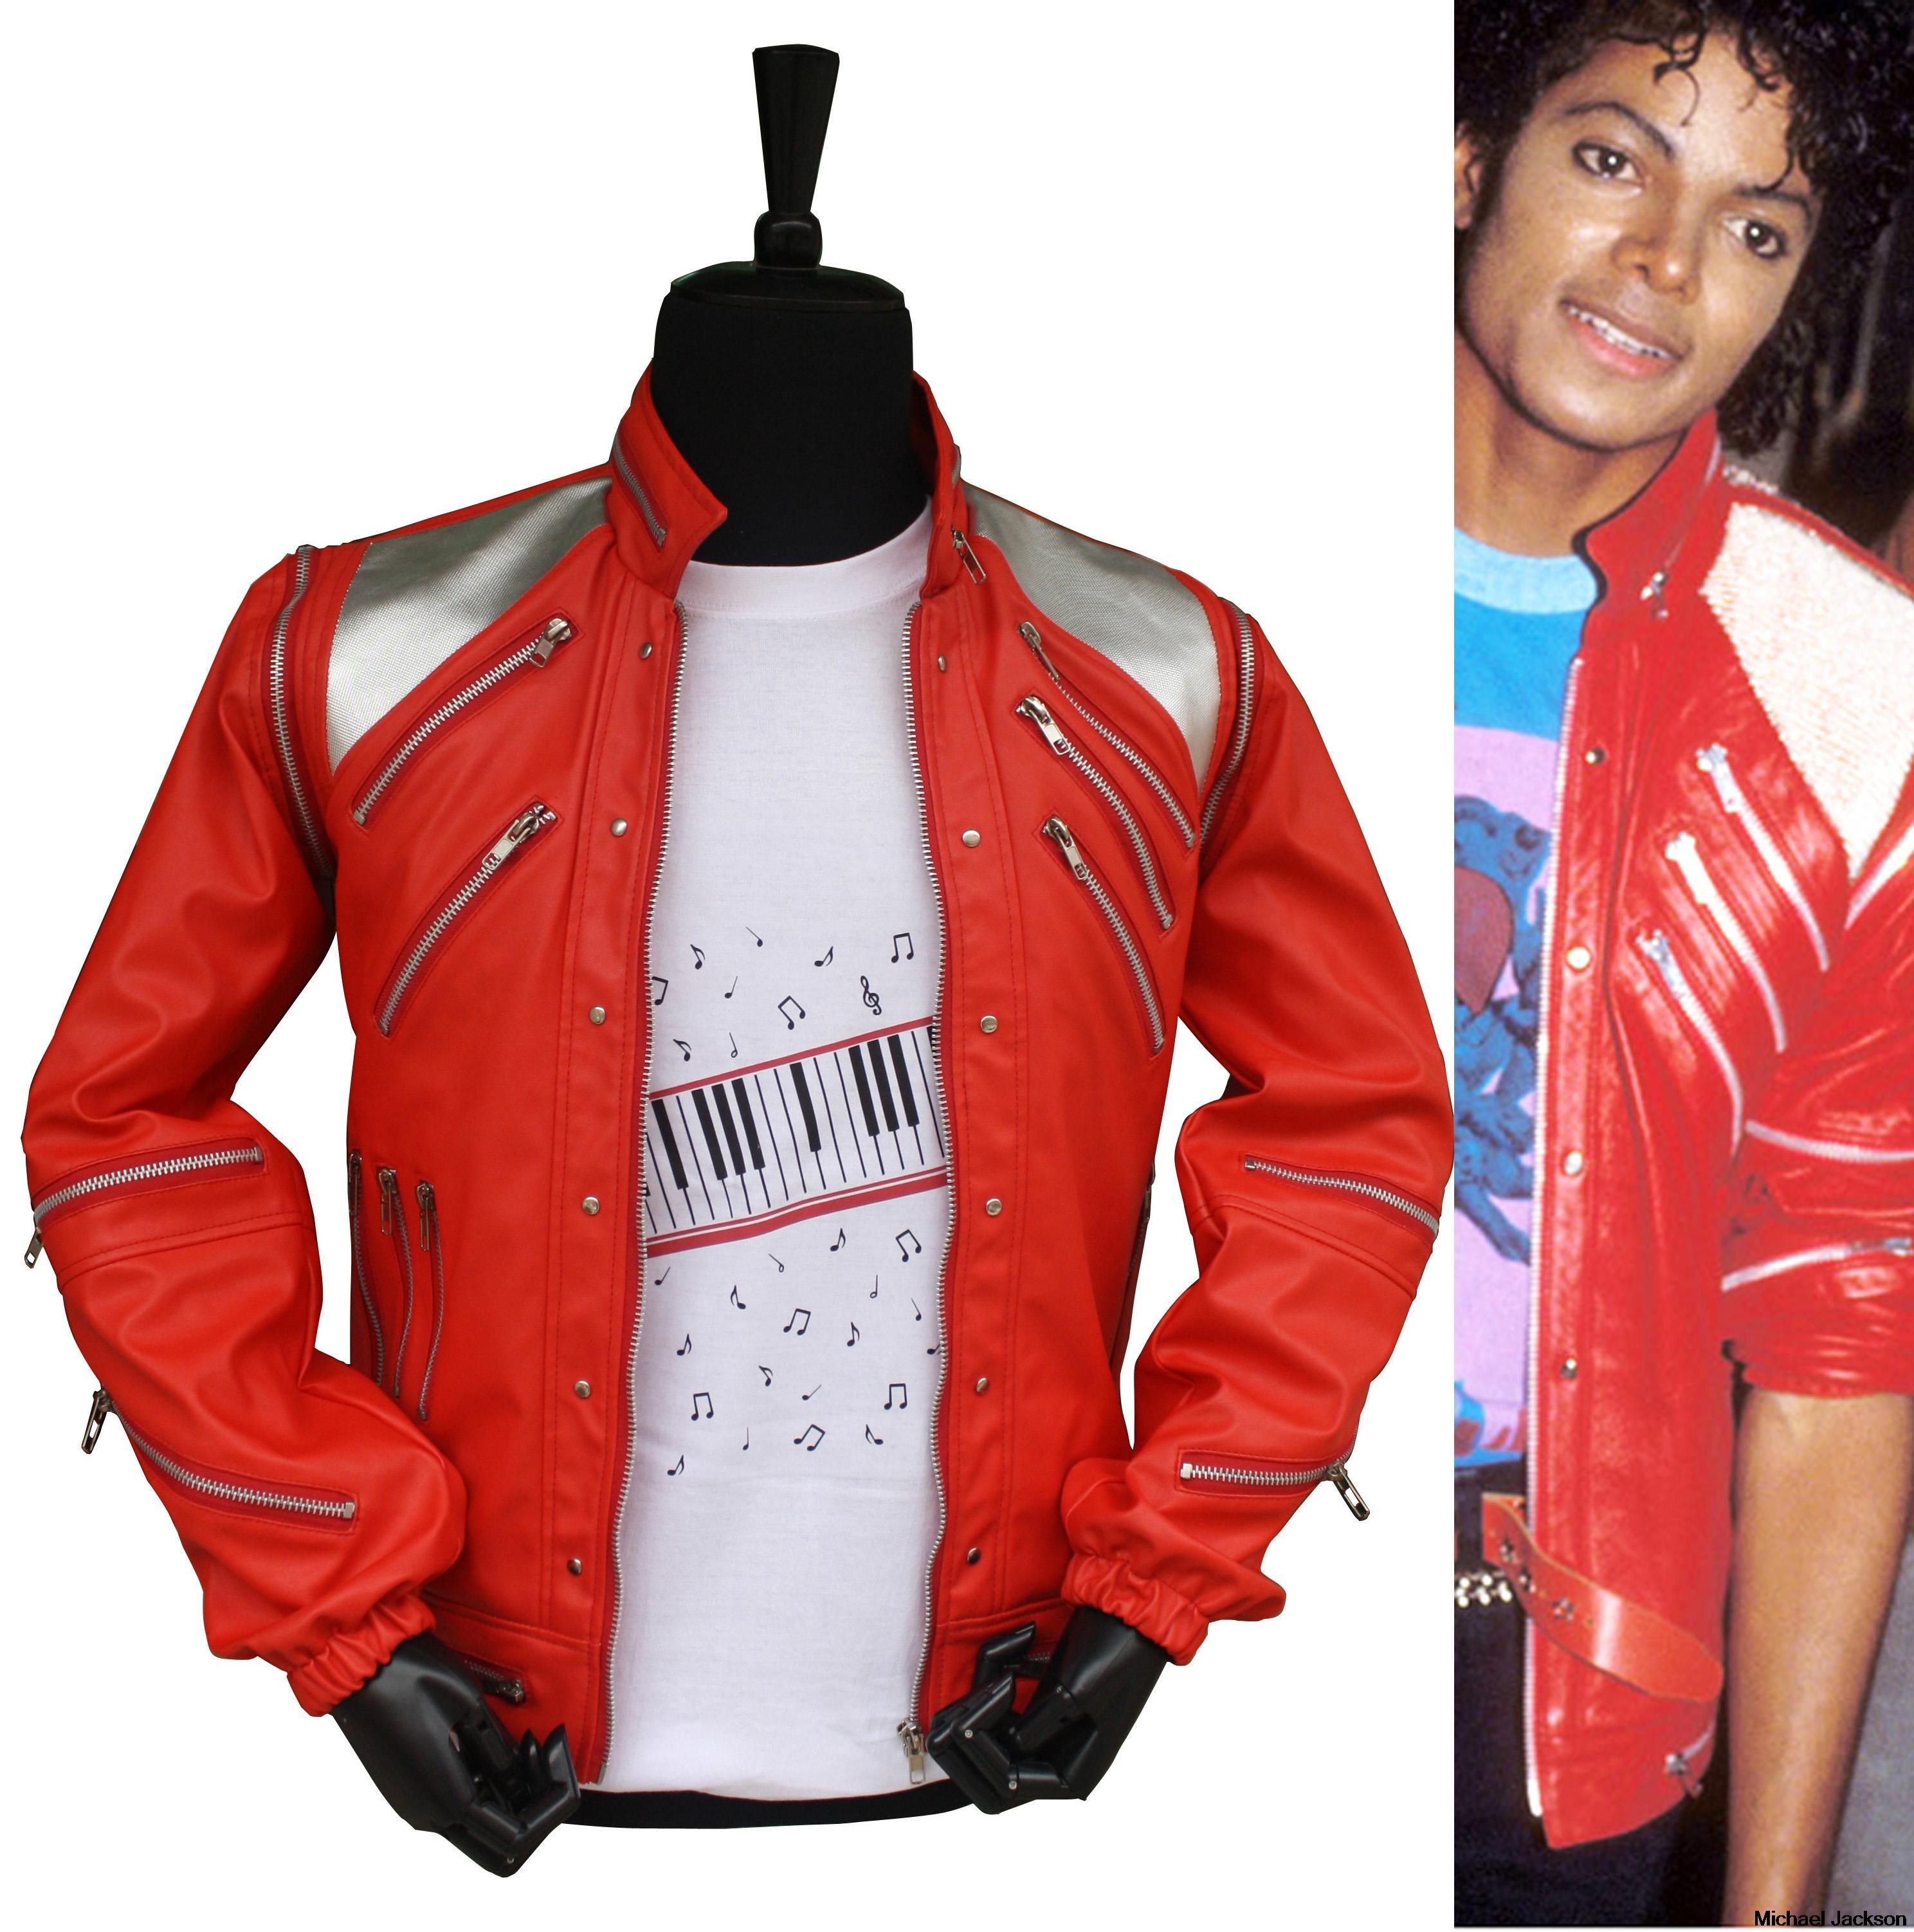 online kaufen großhandel mj rote jacke aus china mj rote jacke, Hause ideen